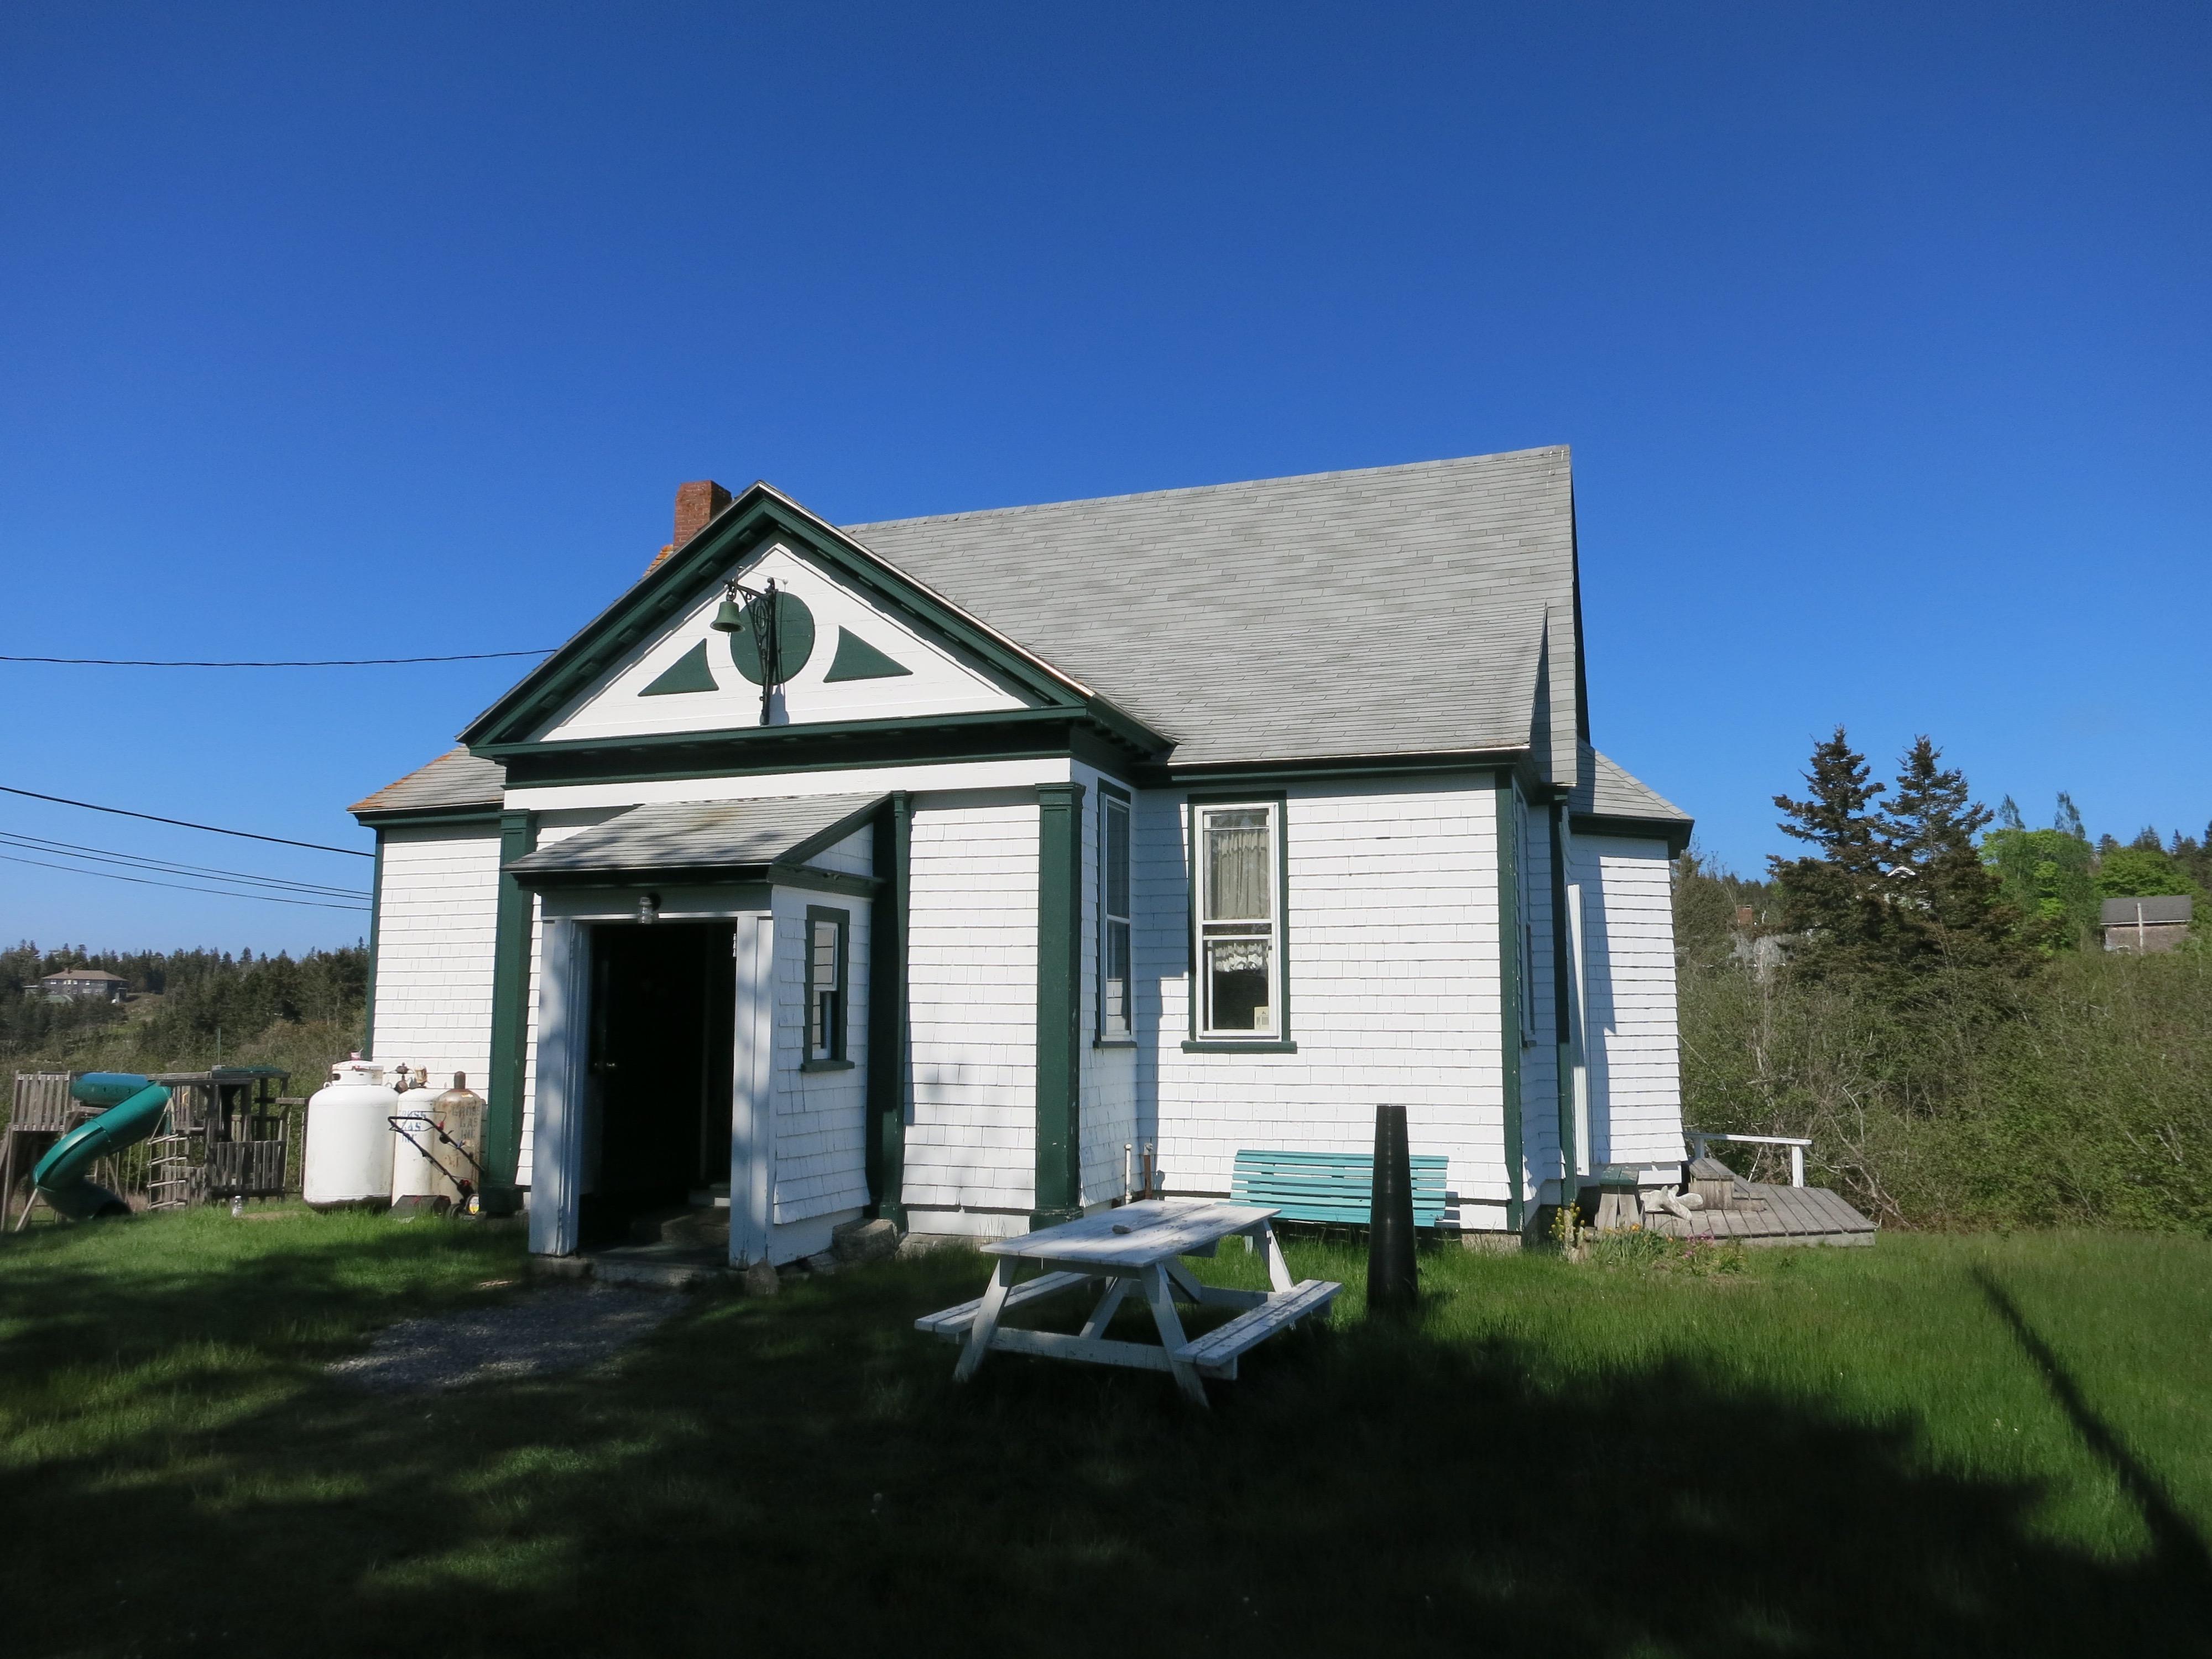 Isle au Haut Schoolhouse